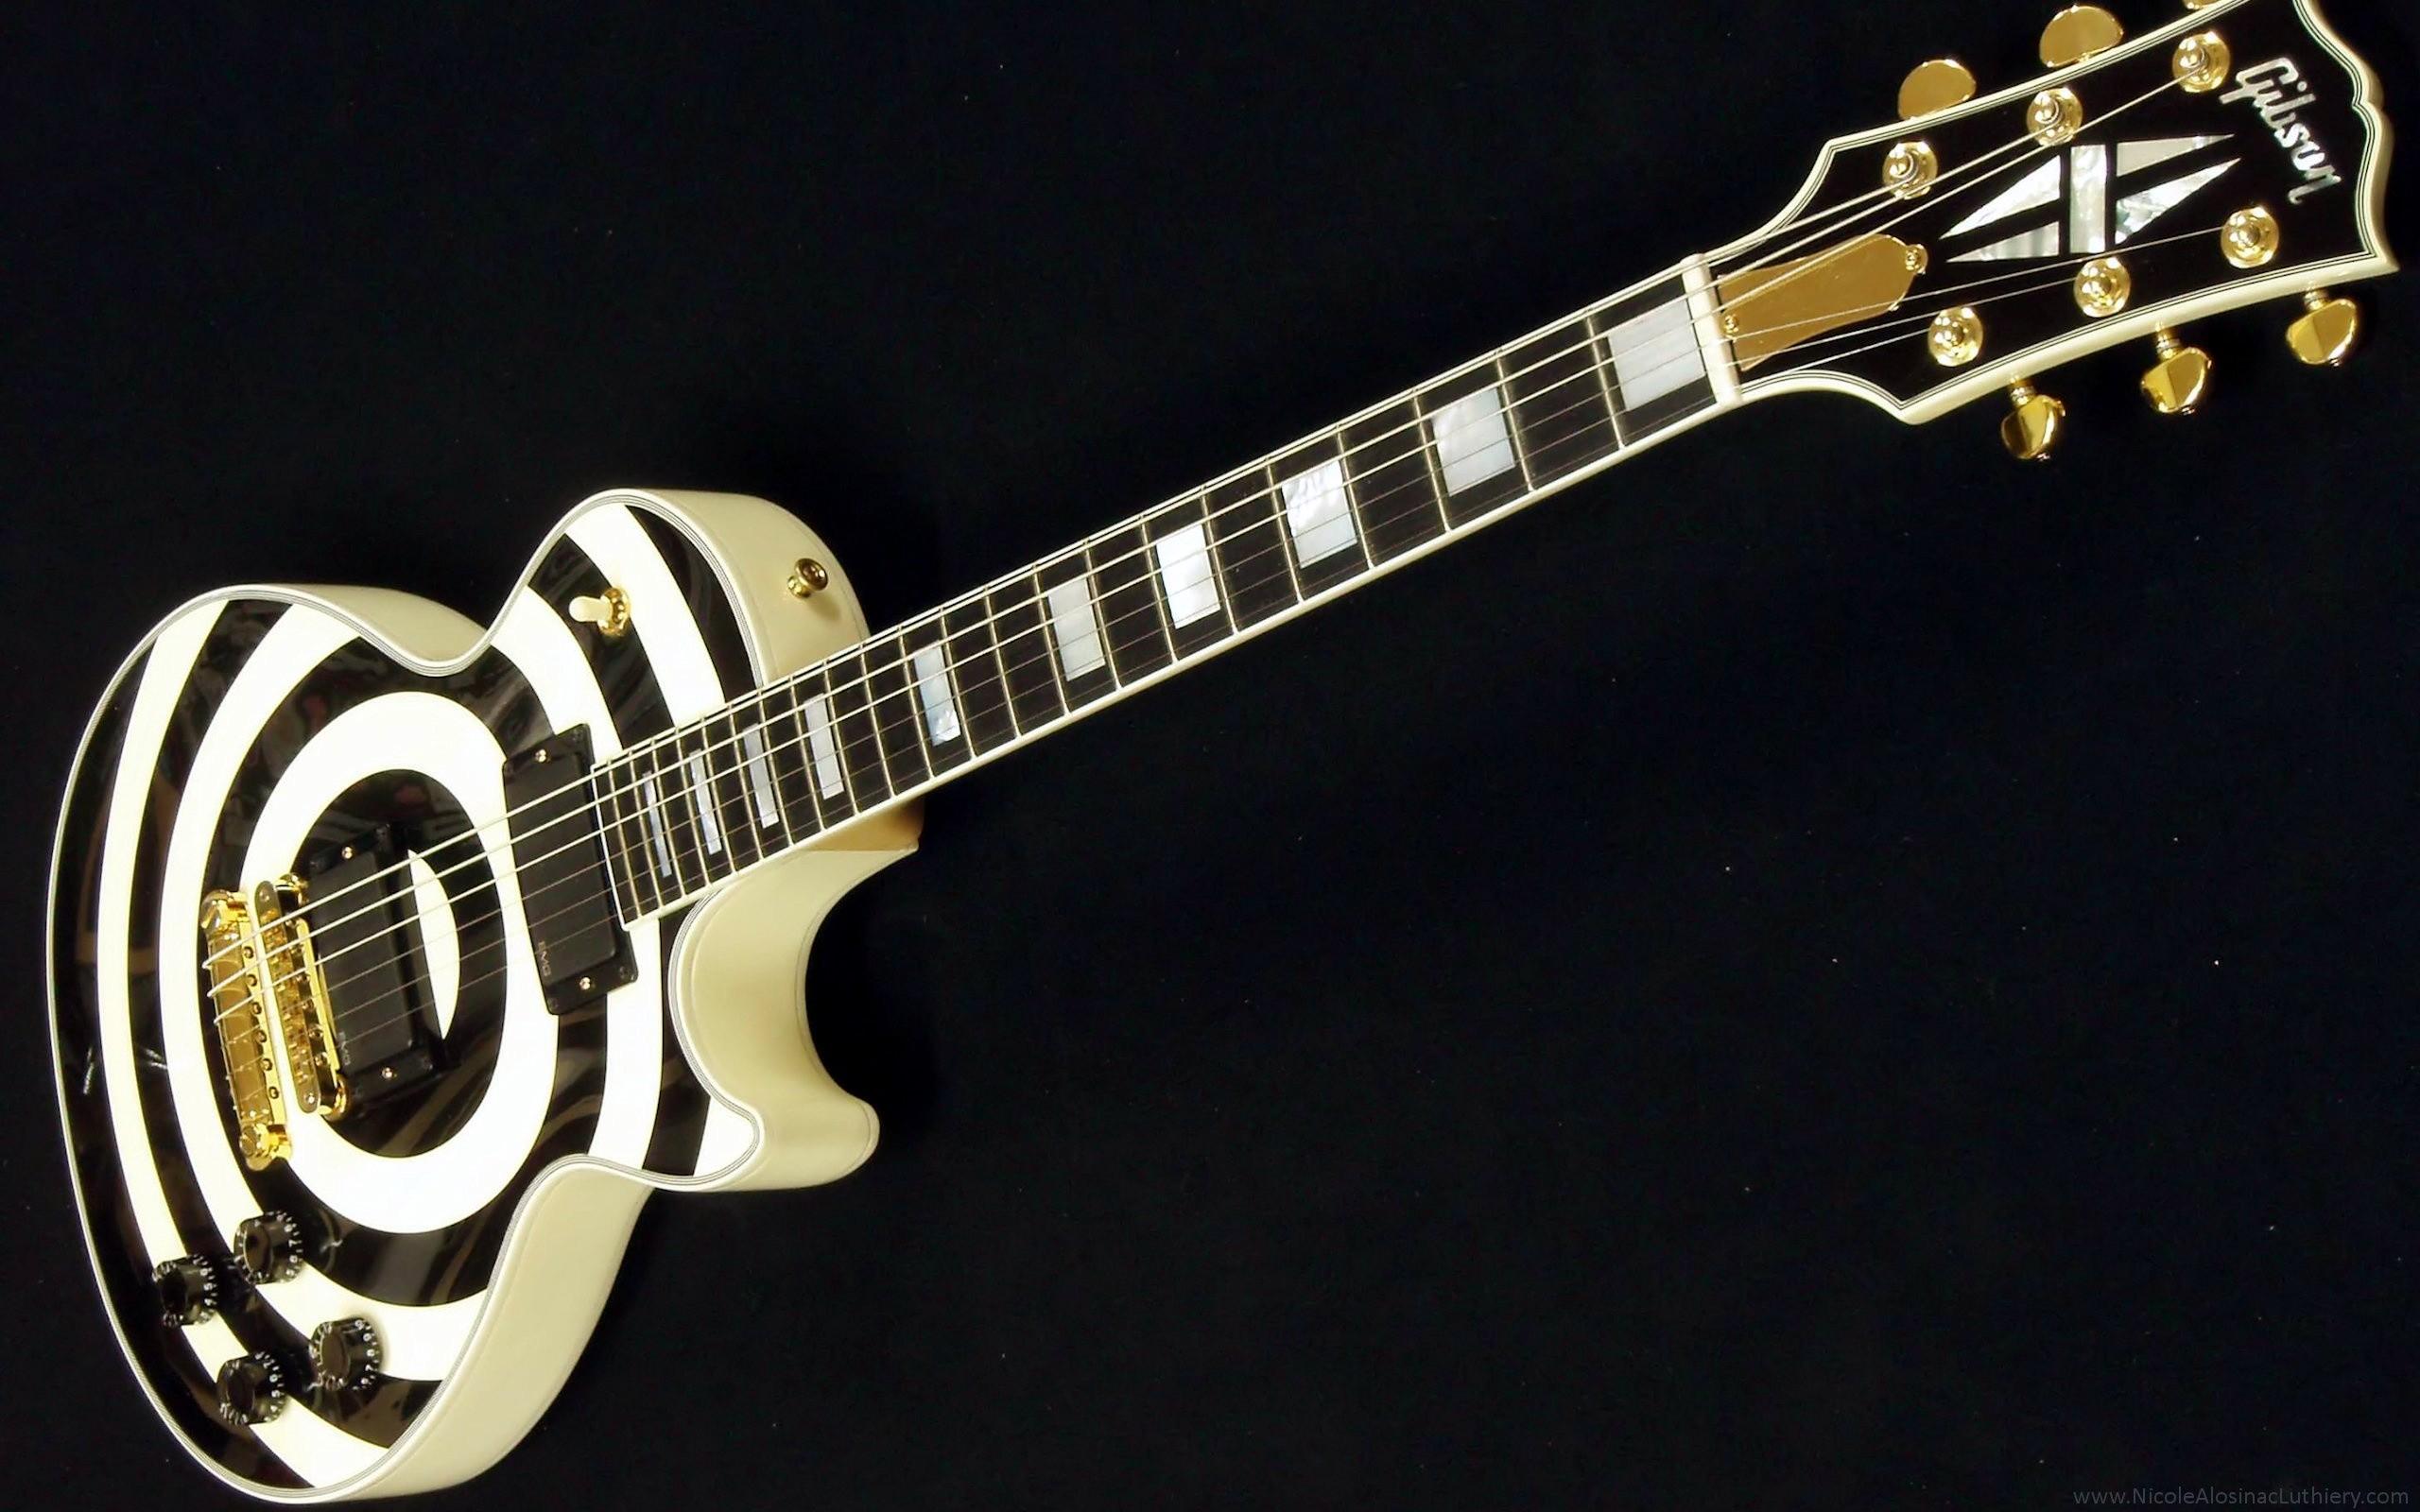 Gibson Zakk Wilde Les Paul Guitar Wallpaper 2560×1600